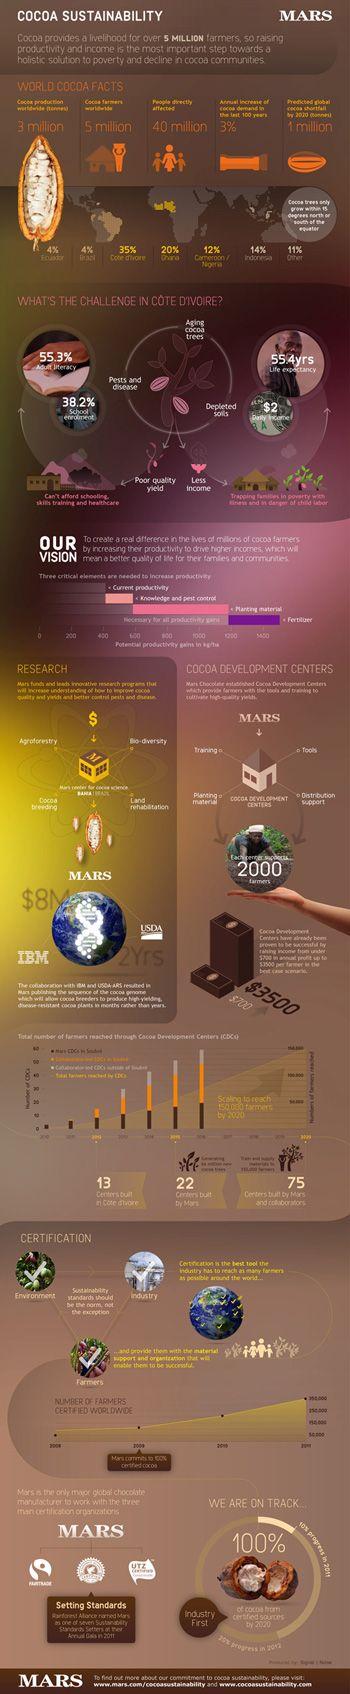 Cocoa sustainability infographic